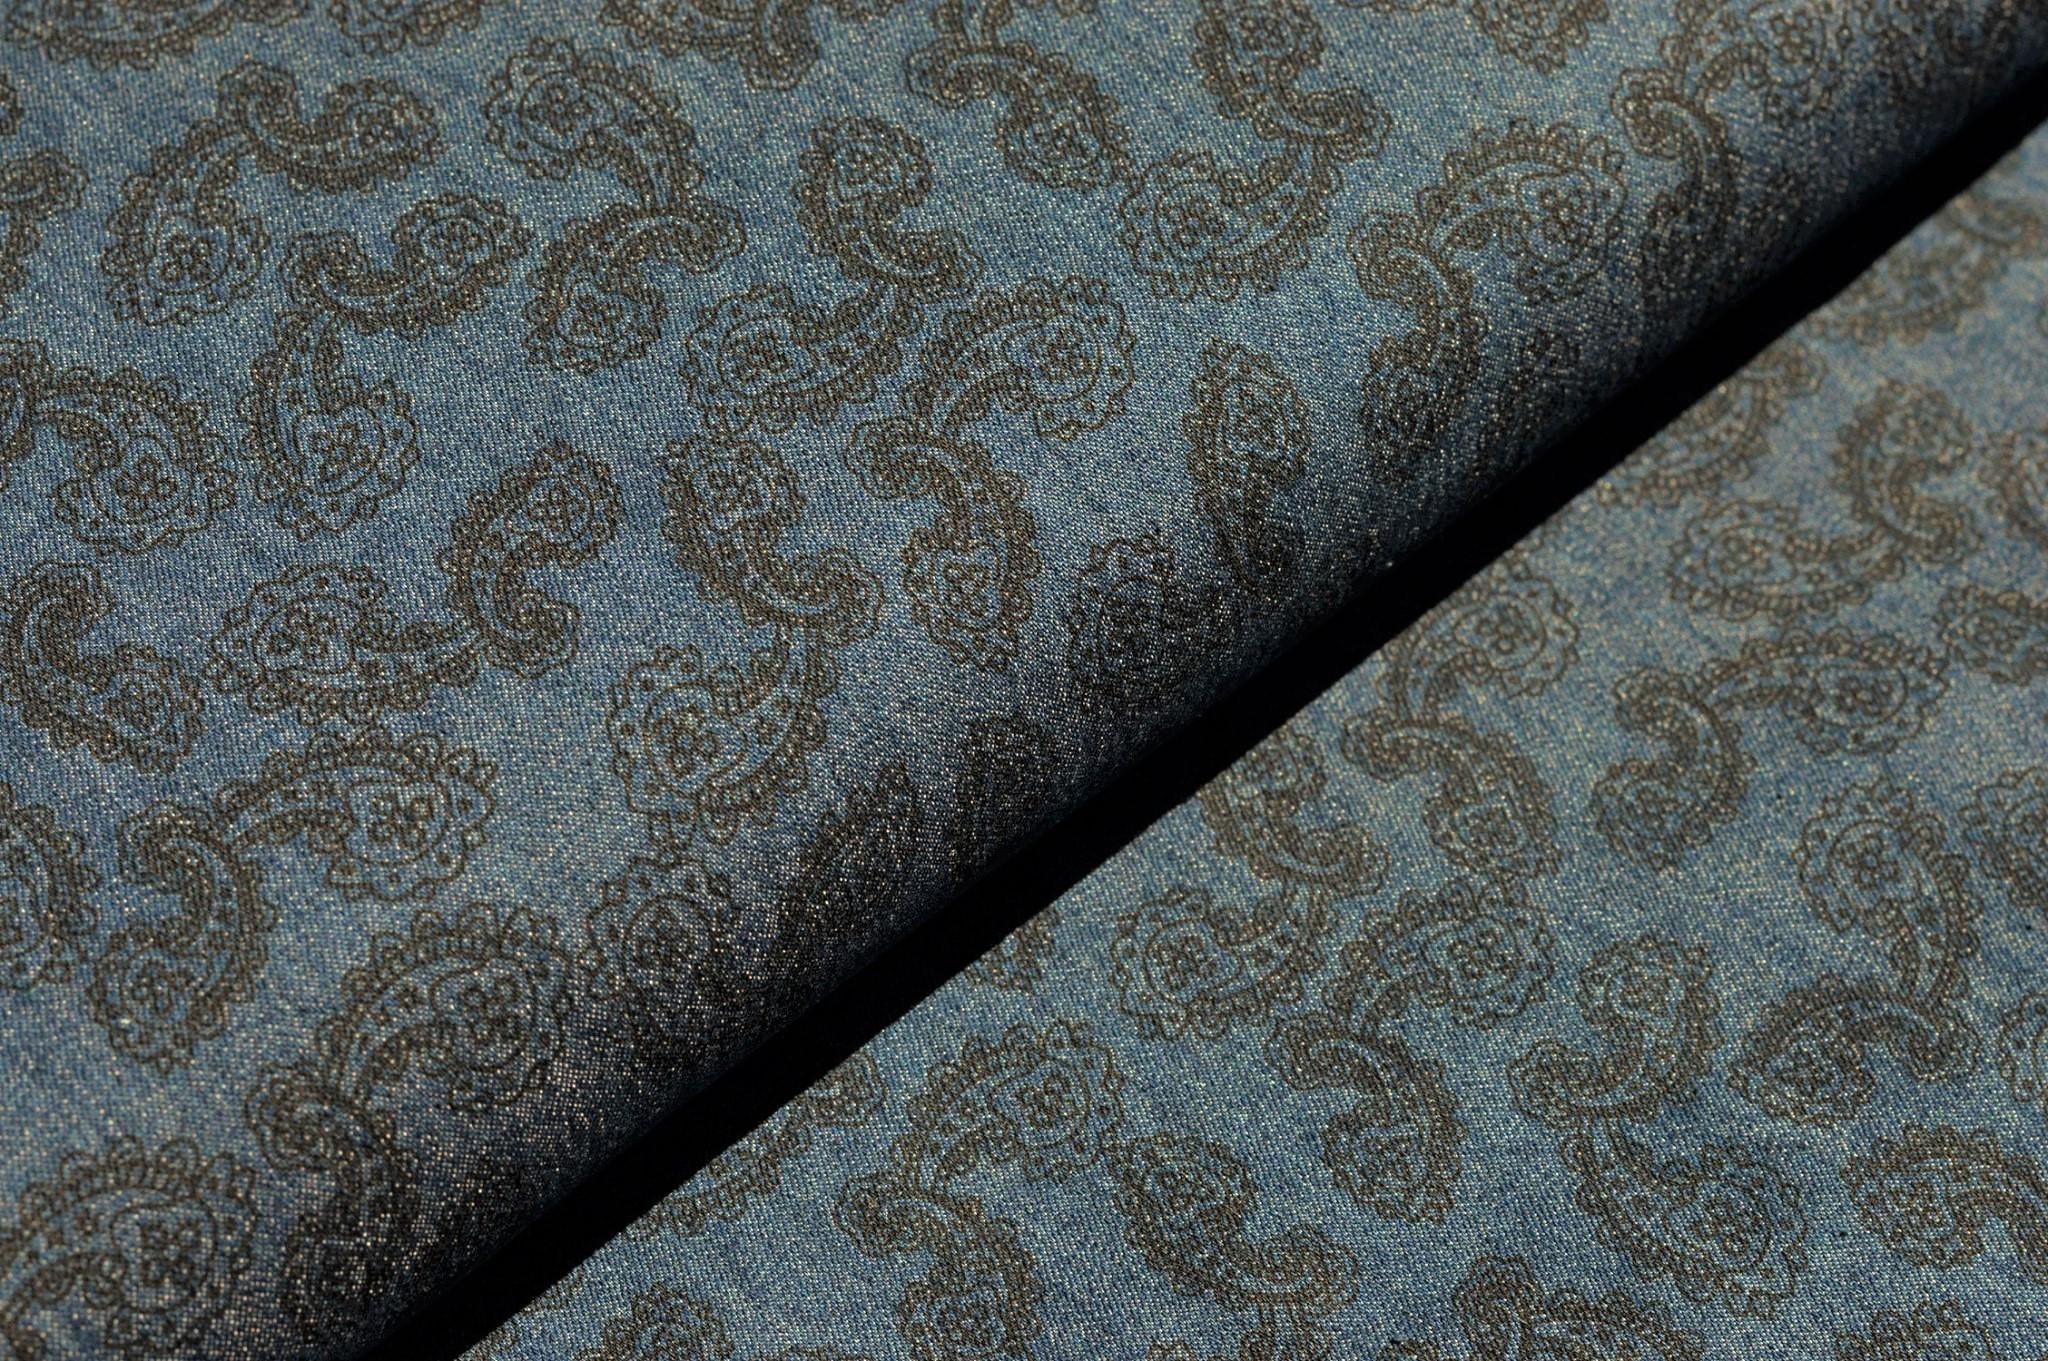 Jeansstoff mit Paisleymuster - dunkles jeansblau